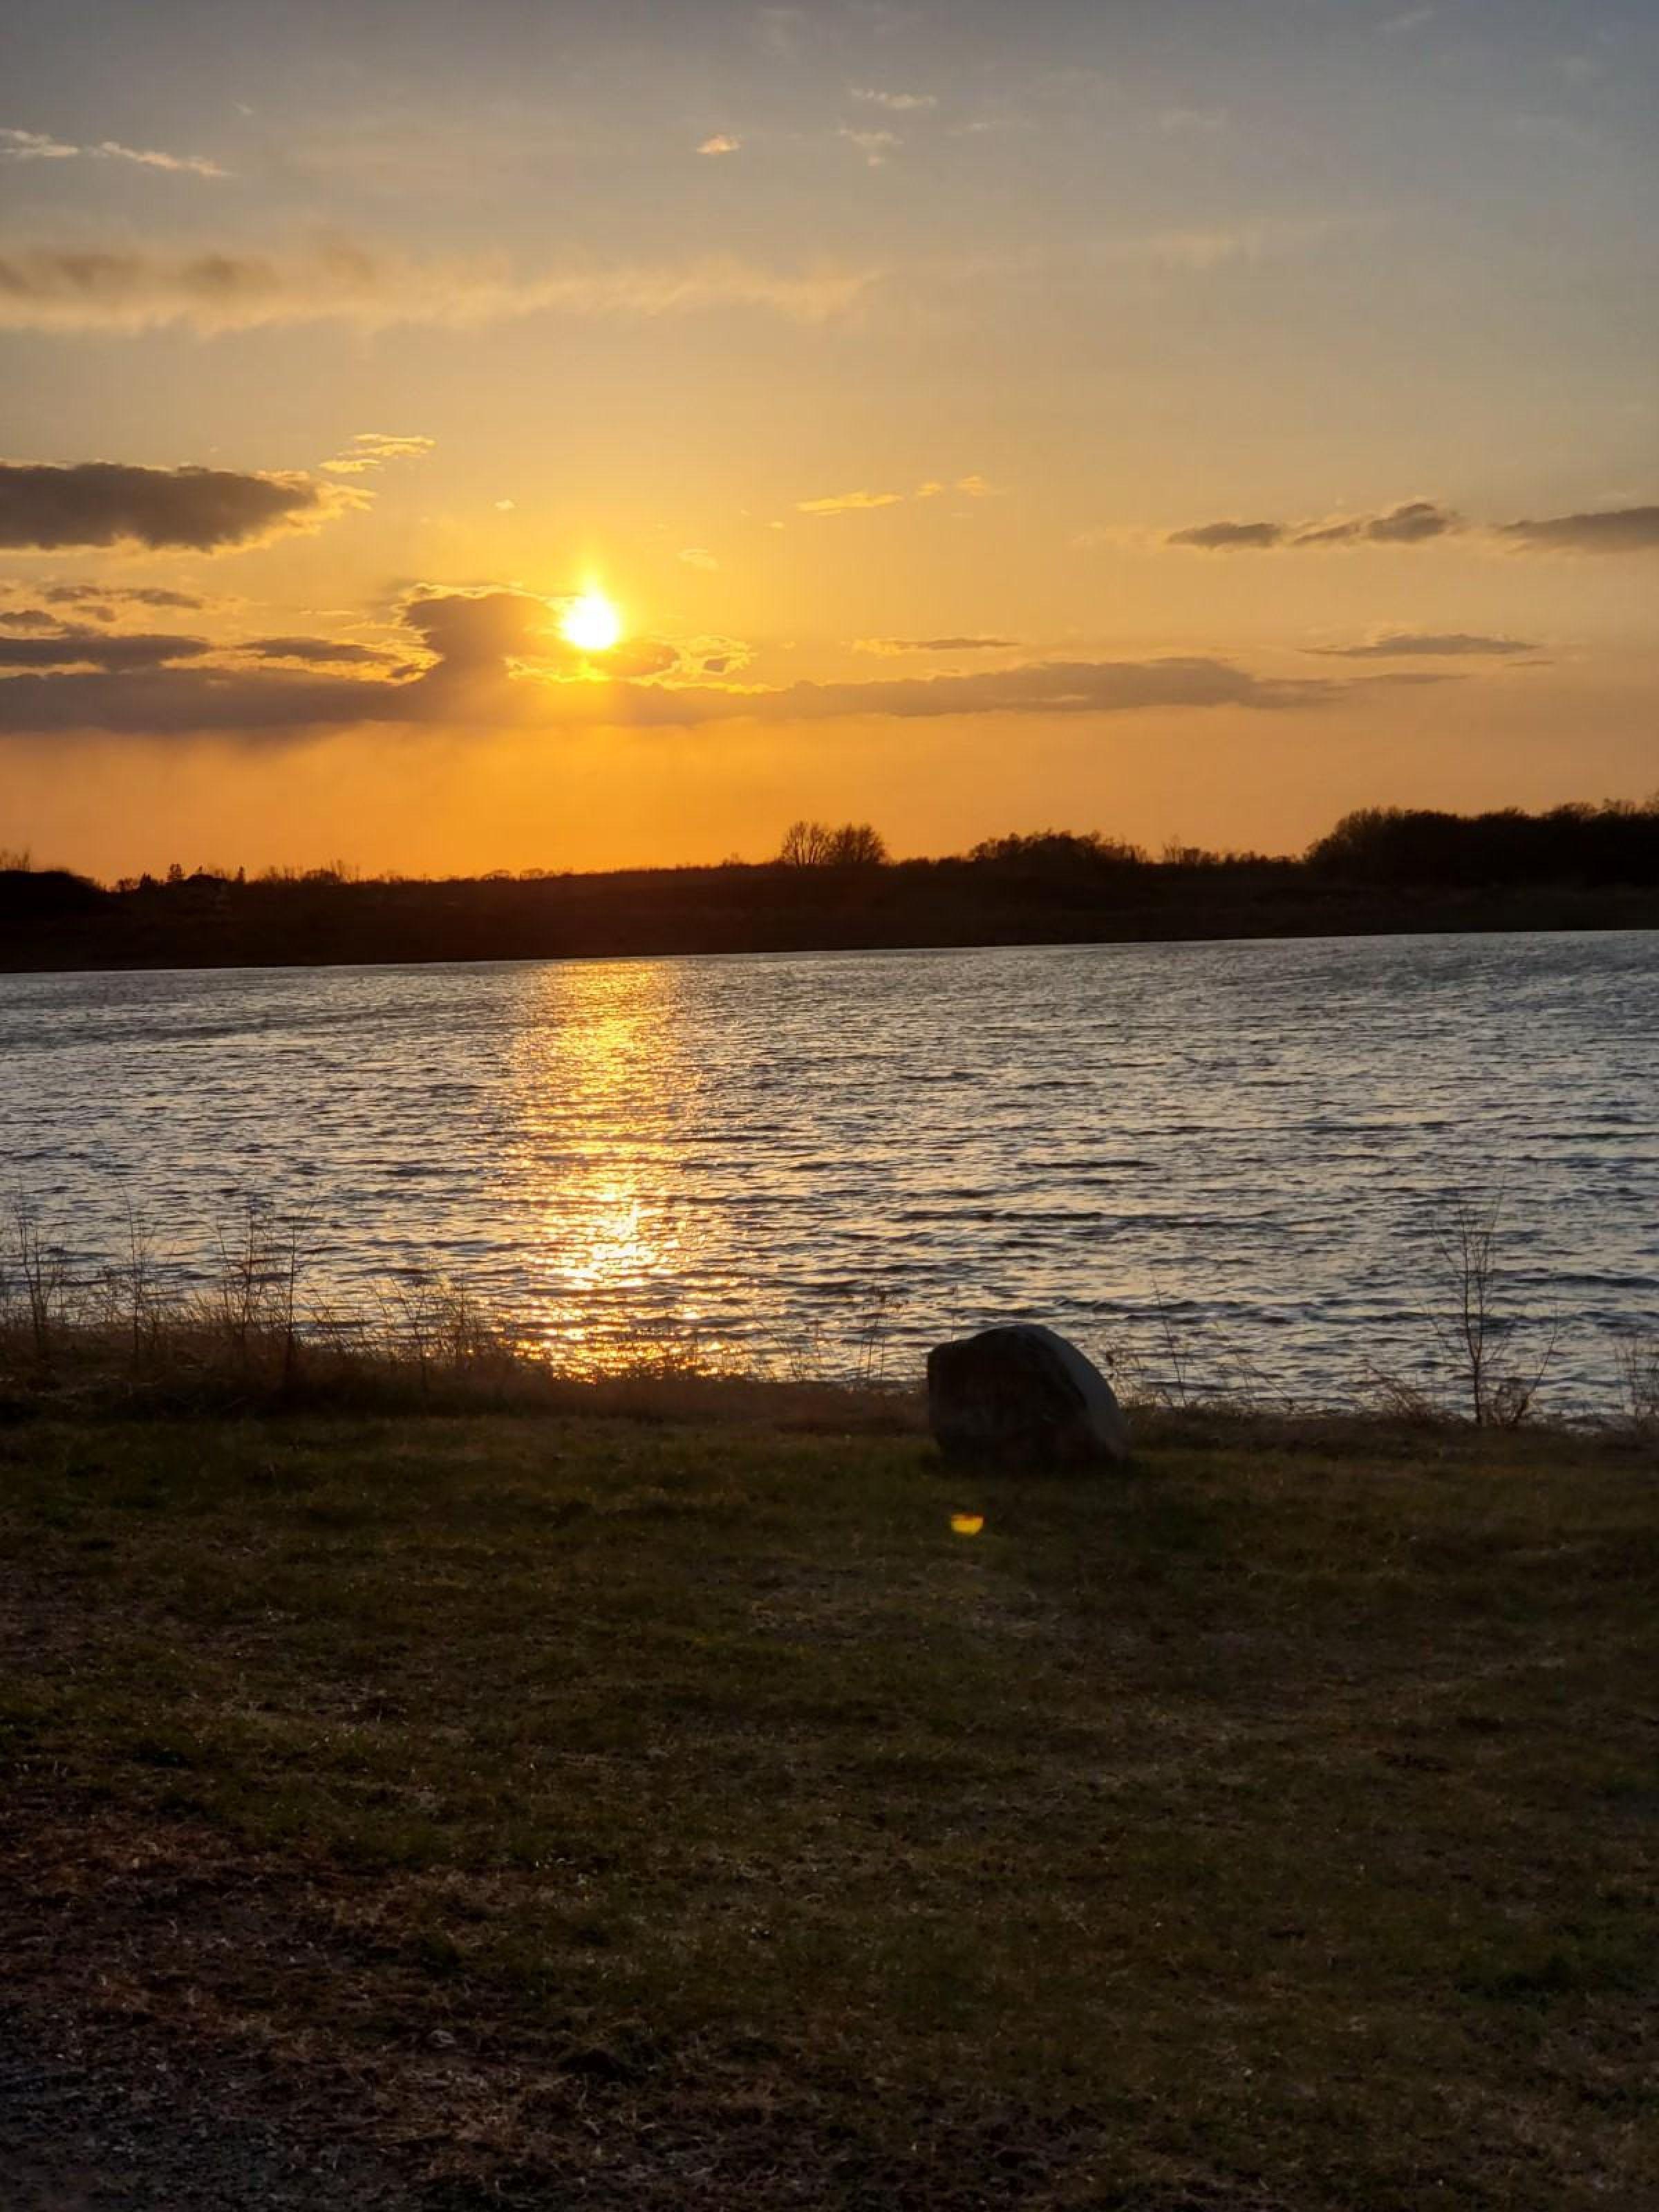 residential-land-mcleod-county-minnesota-80-acres-listing-number-15182-14-2020-09-23-163834.jpeg